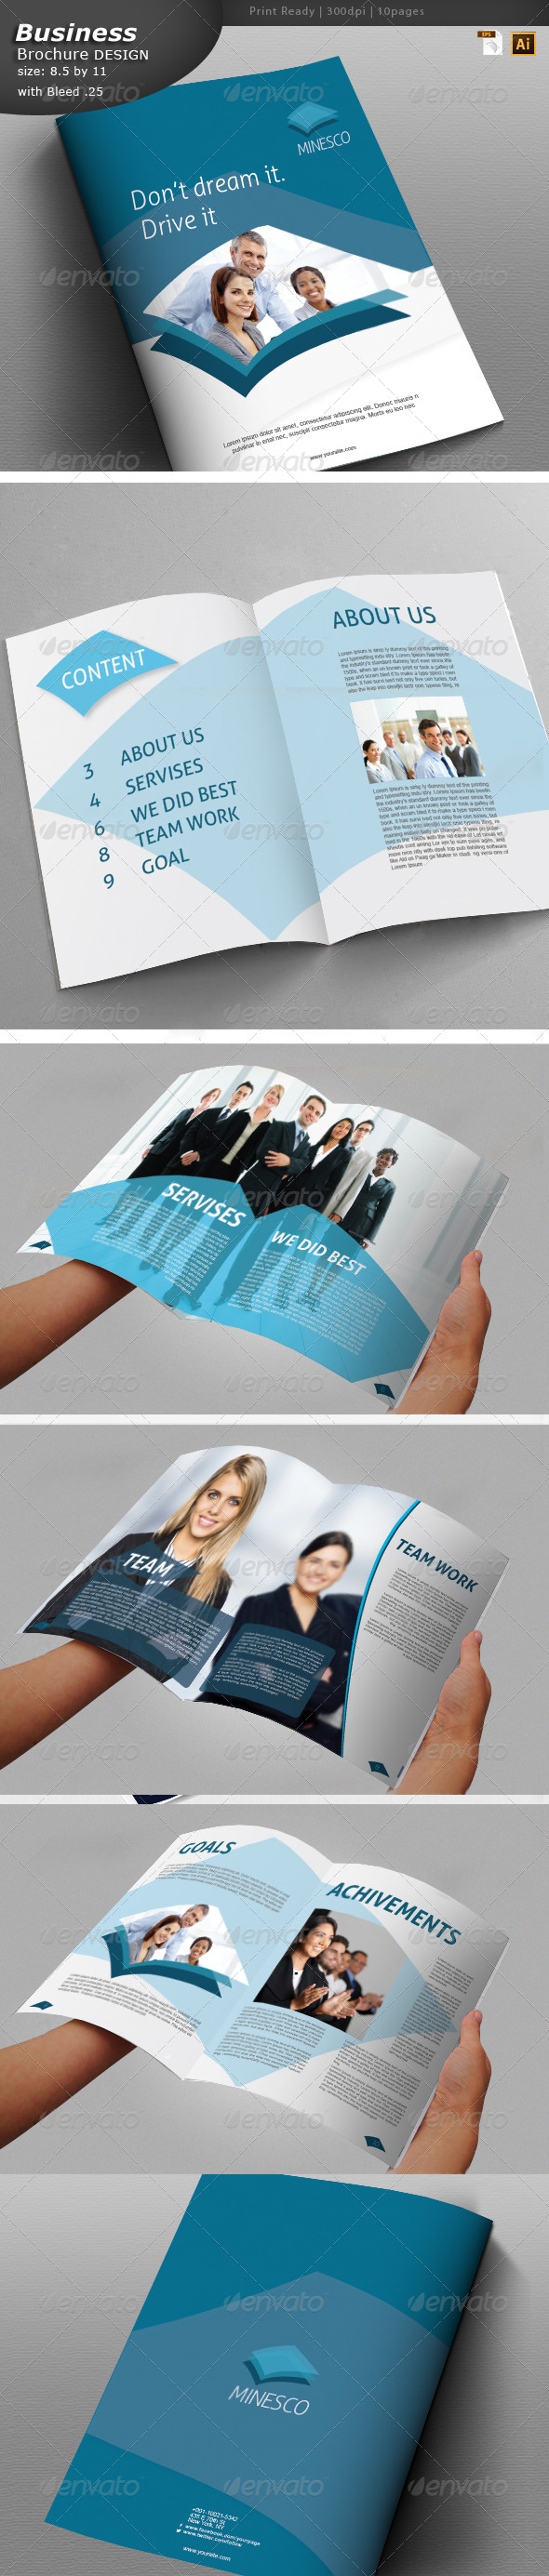 GraphicRiver Business Brochure Design 5939928